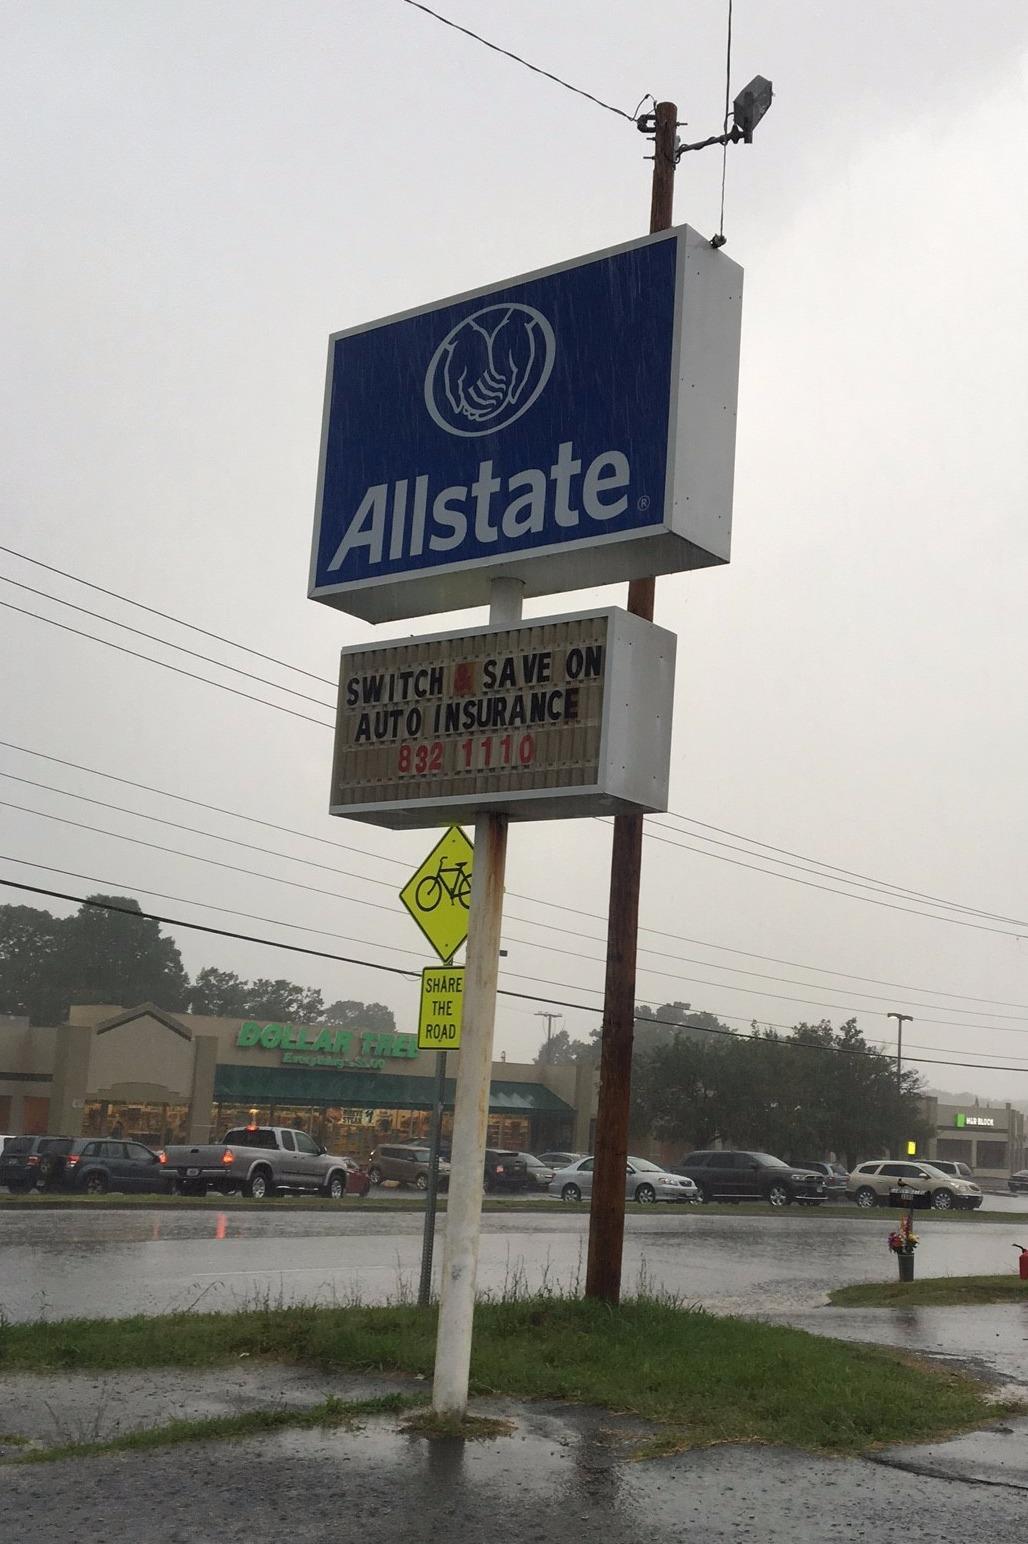 Robert Gammon: Allstate Insurance image 1